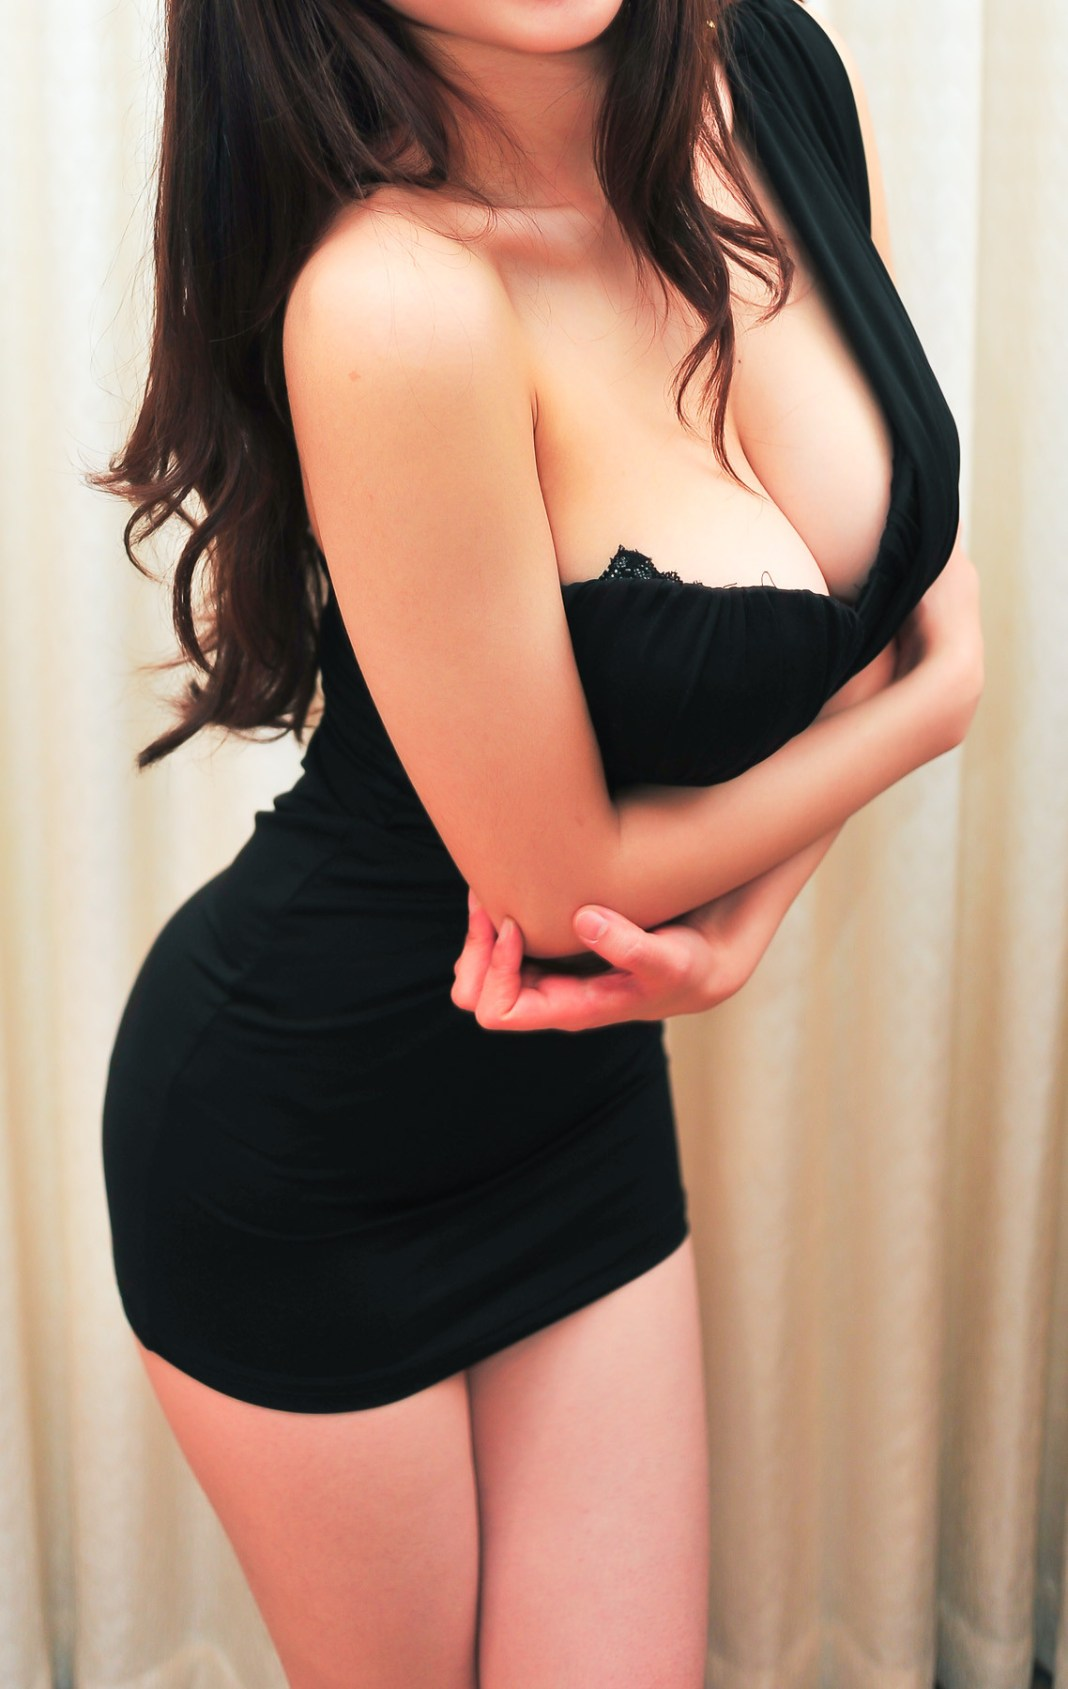 Asian-Model-Jasmine-Lee-Big-Boobs-www.ohfree.net-013 Sexy Asian Model Jasmine Lee Topless Show Big Boobs Photos